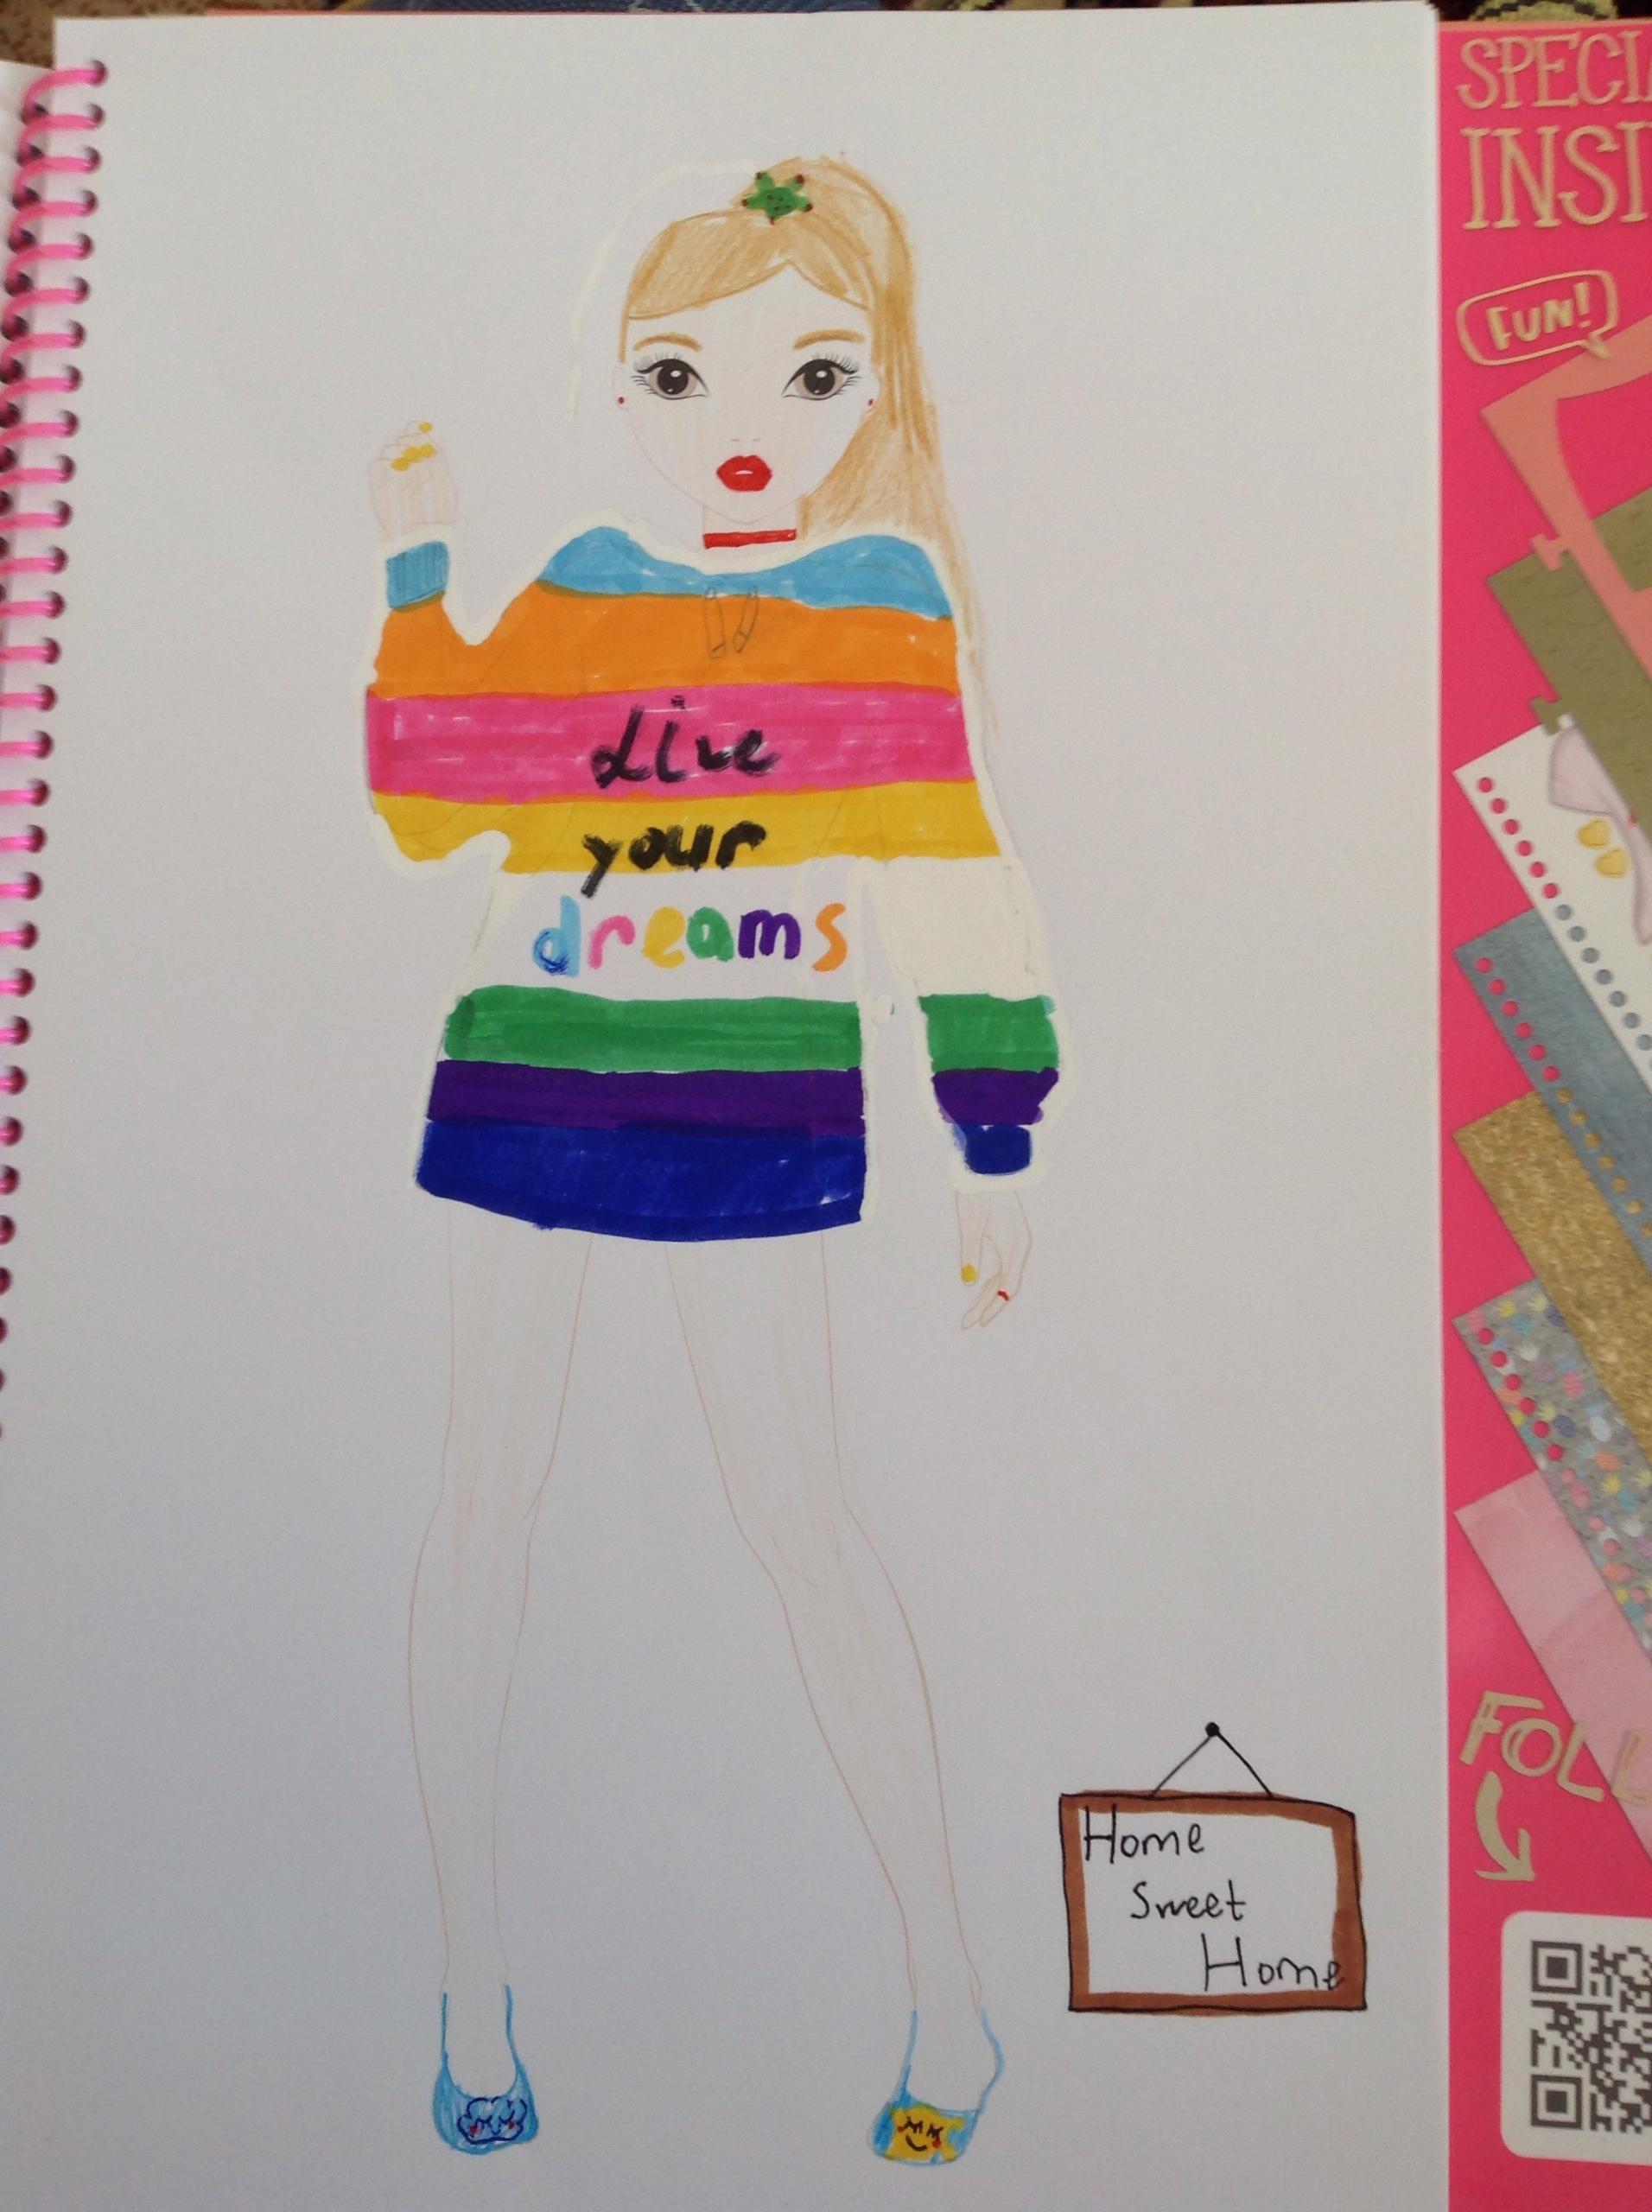 Karina S., 11years, from Gyumri